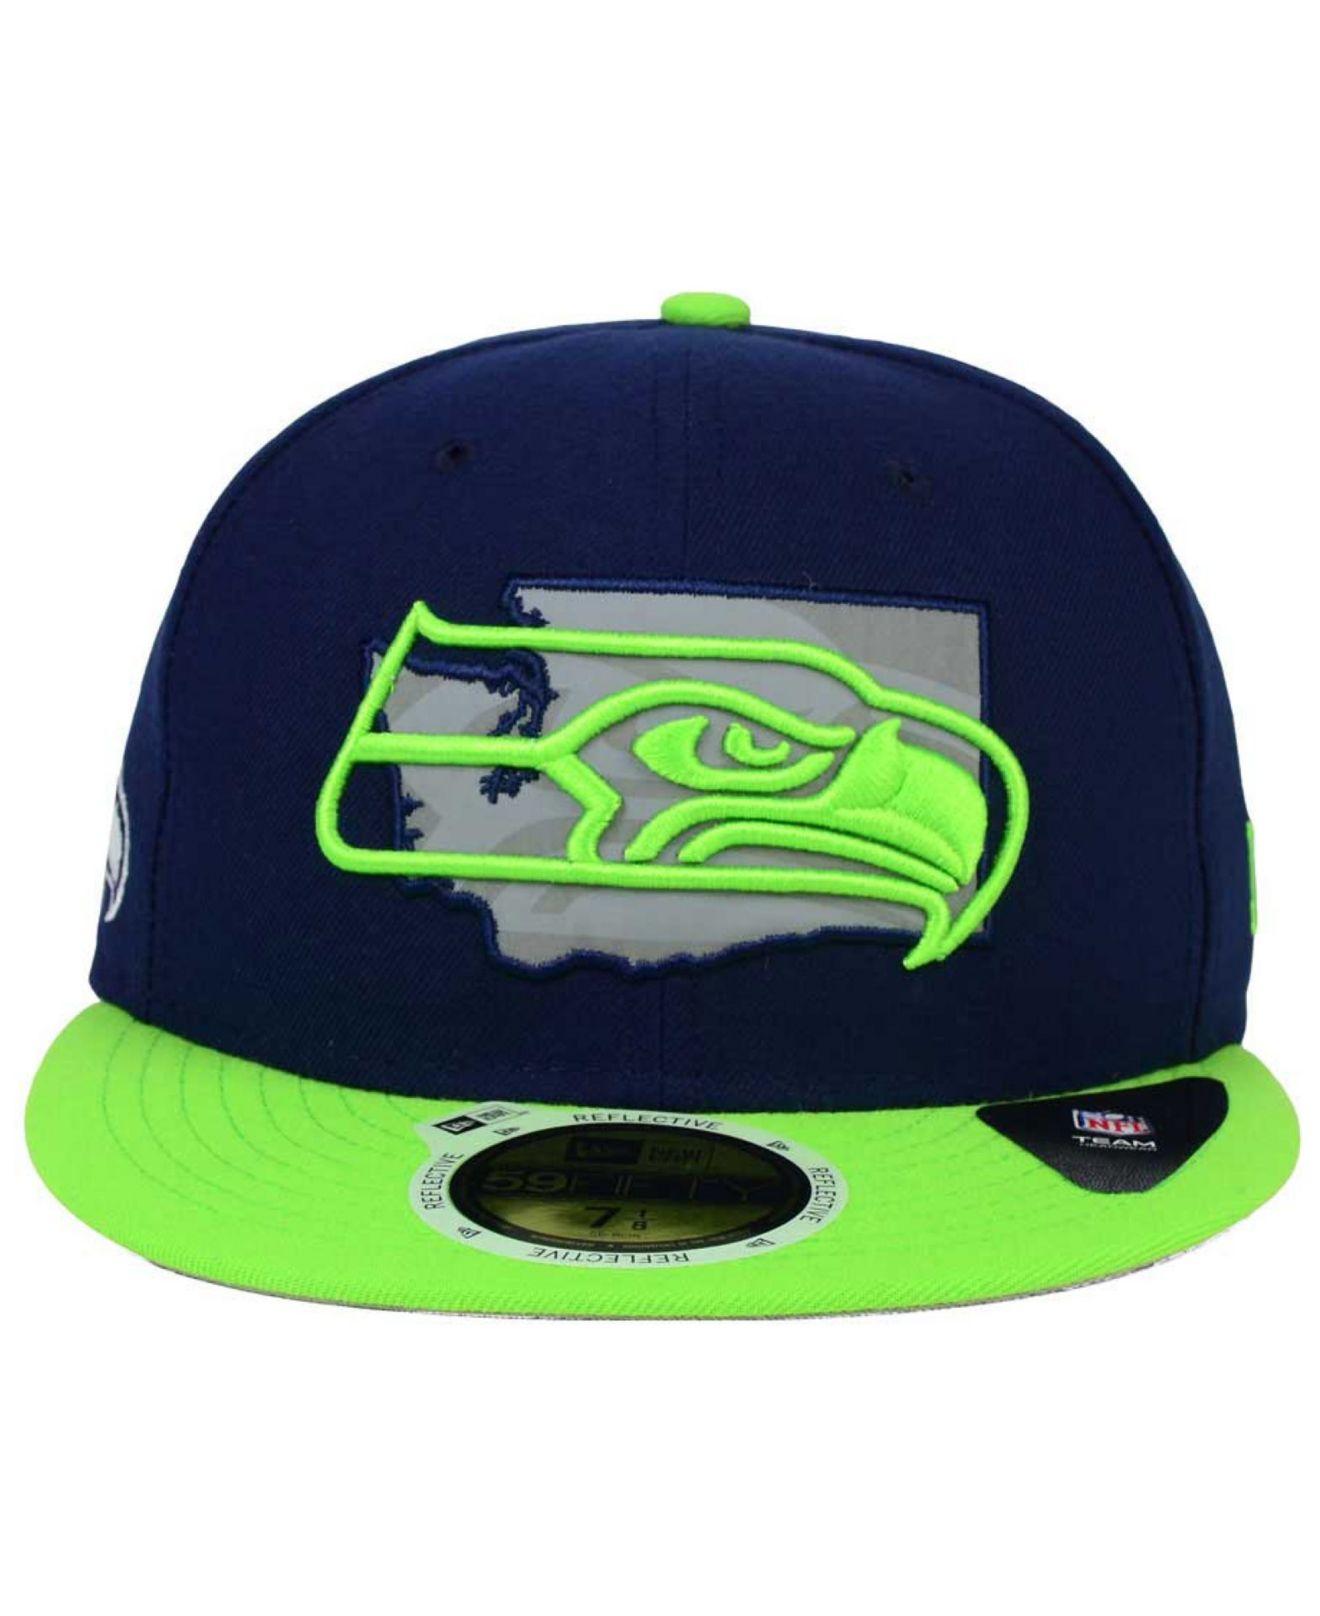 e27f6ff9e73 closeout lyst ktz seattle seahawks state flective redux 59fifty cap buying  cheap d0a08 14f0a new era